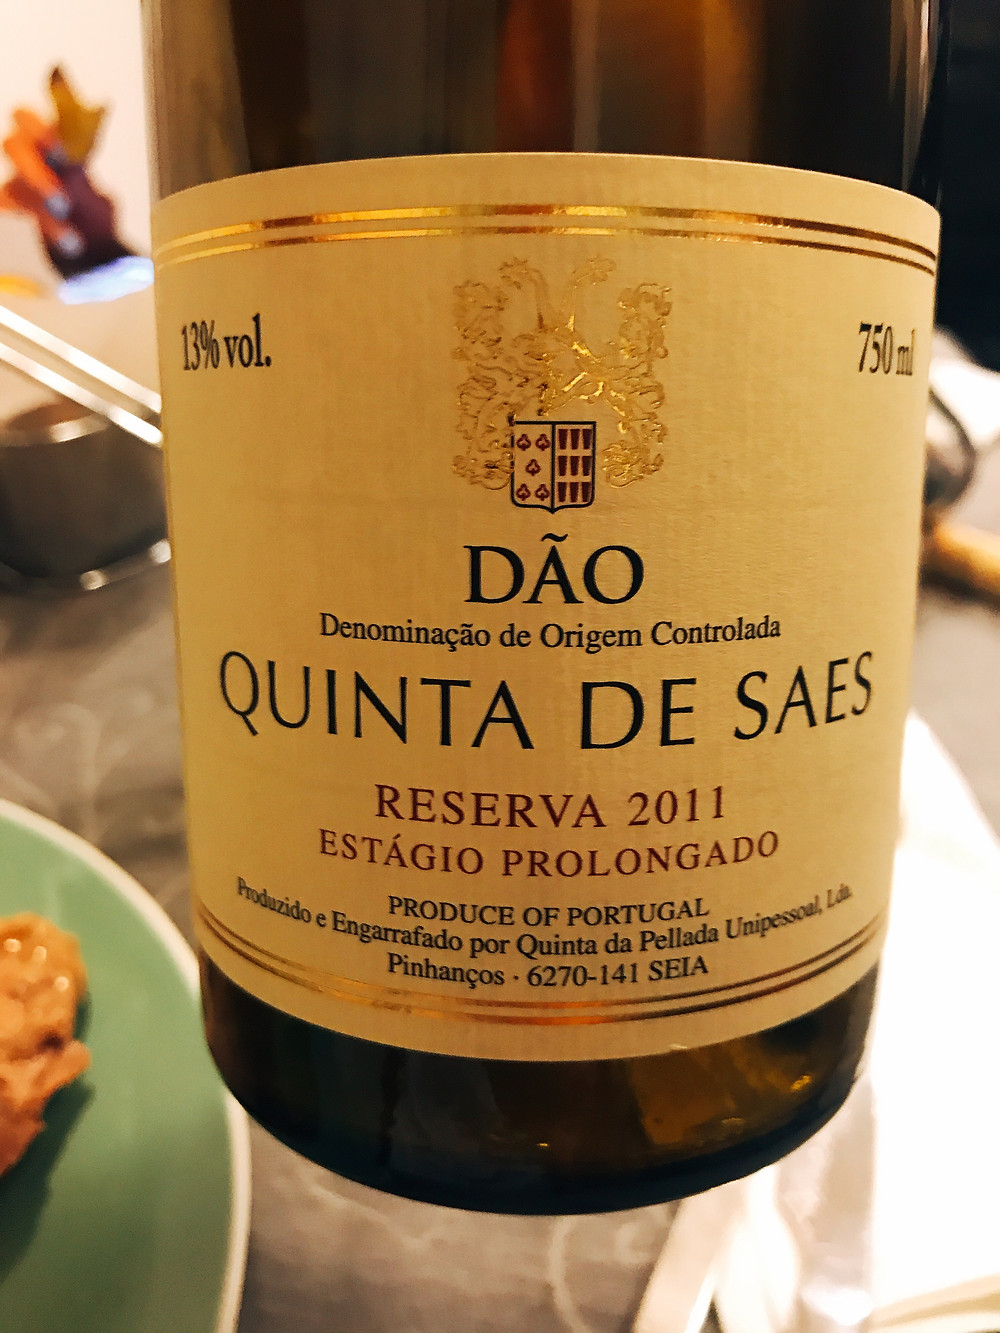 Quinta de Saes Estágio Prolongado Late Release 2011